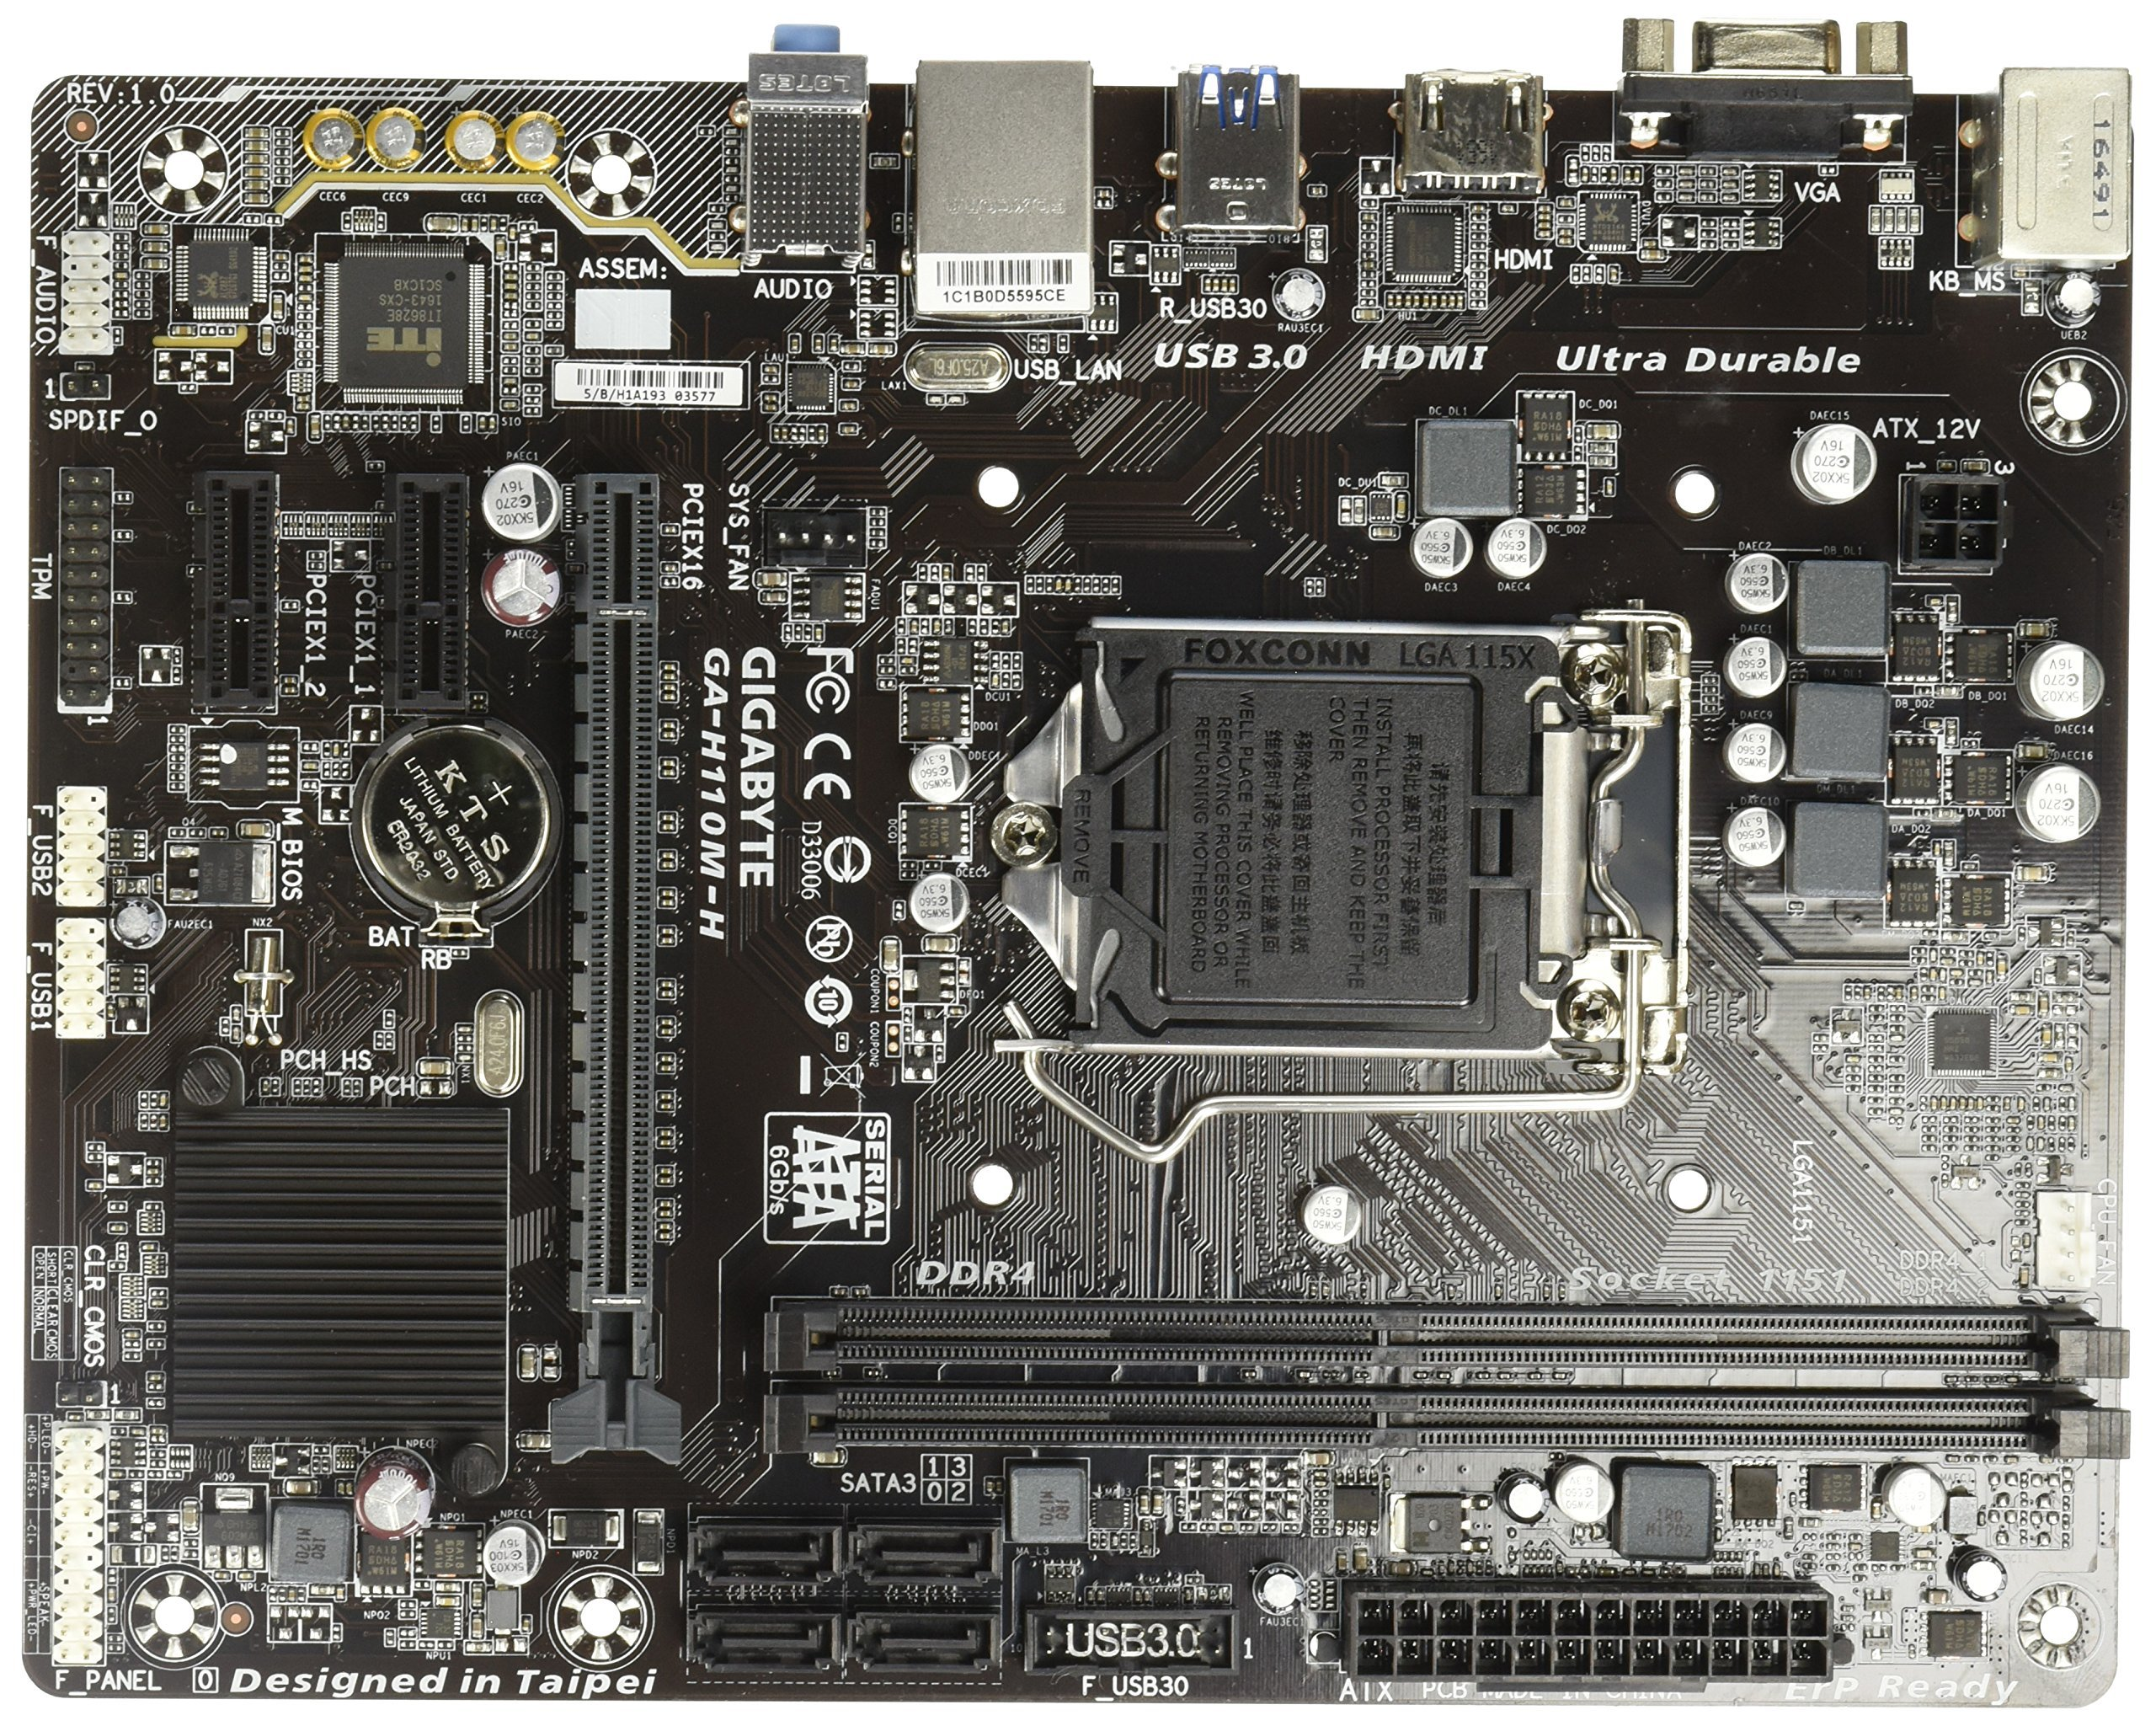 Gigabyte Micro ATX 2 x DDR4 DIMM 4 x SATA 6Gb/s Motherboard (GA-H110M-H) by Gigabyte